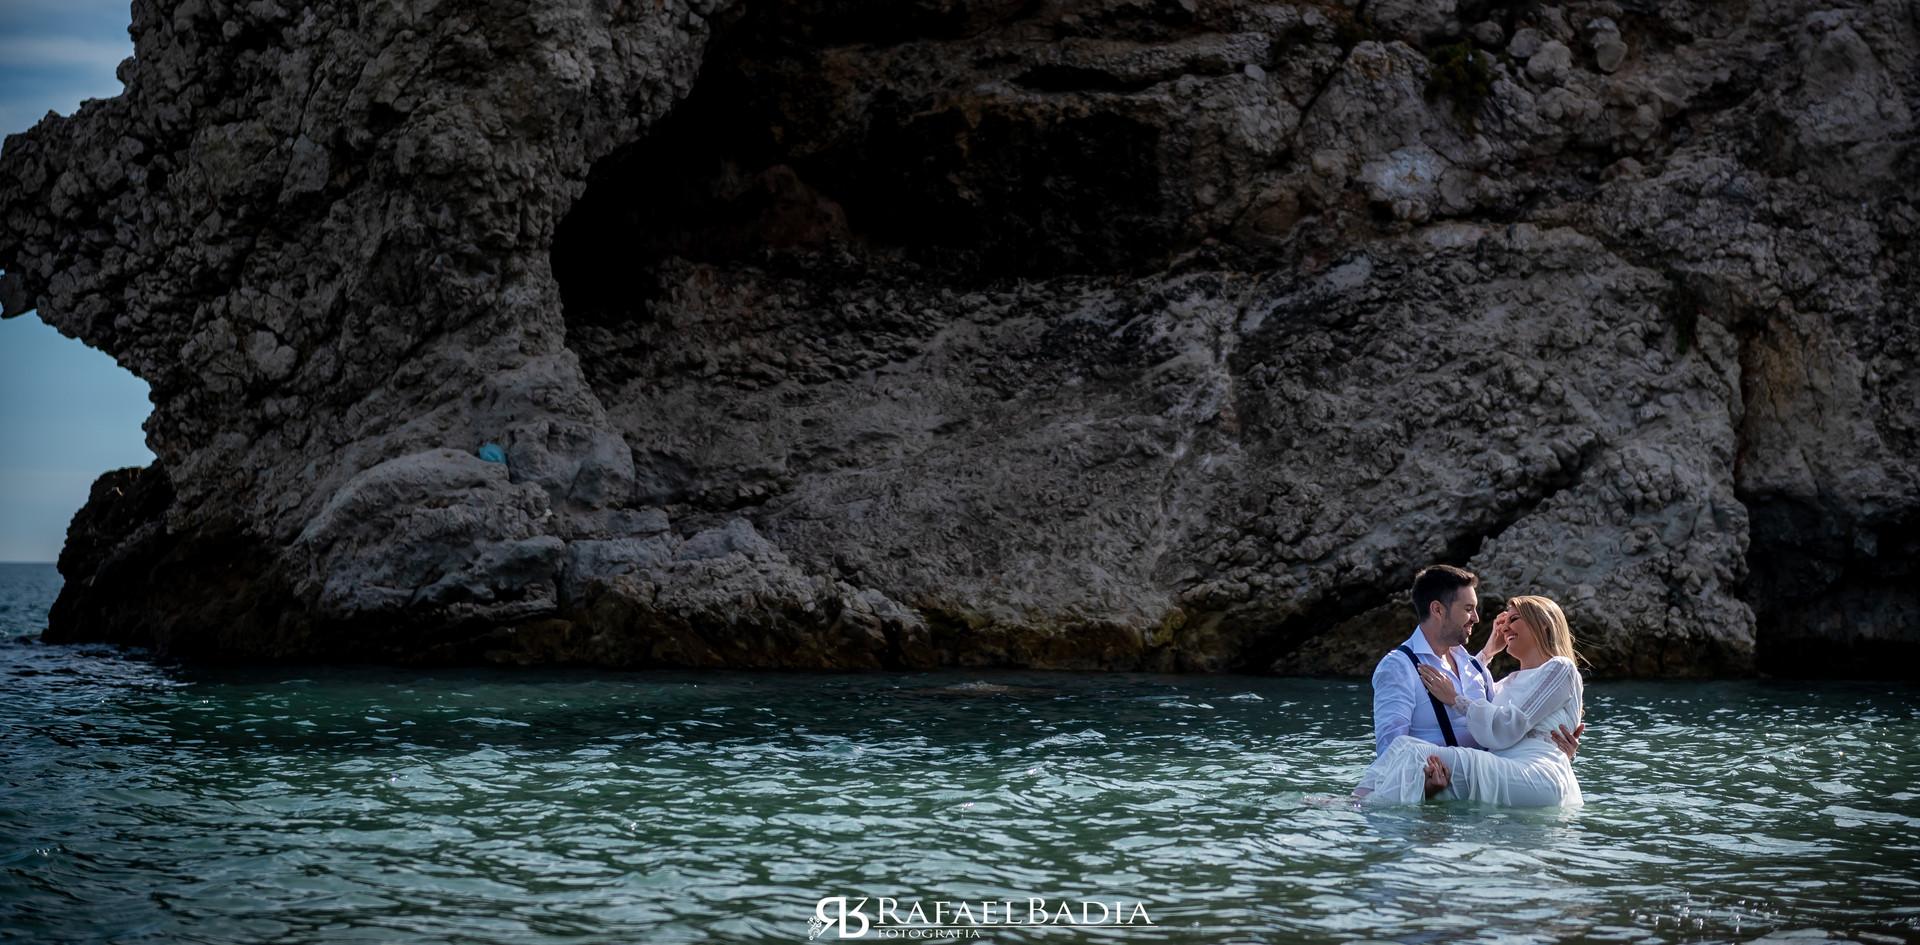 Rafael Badia - Fotografia Post-121.jpg